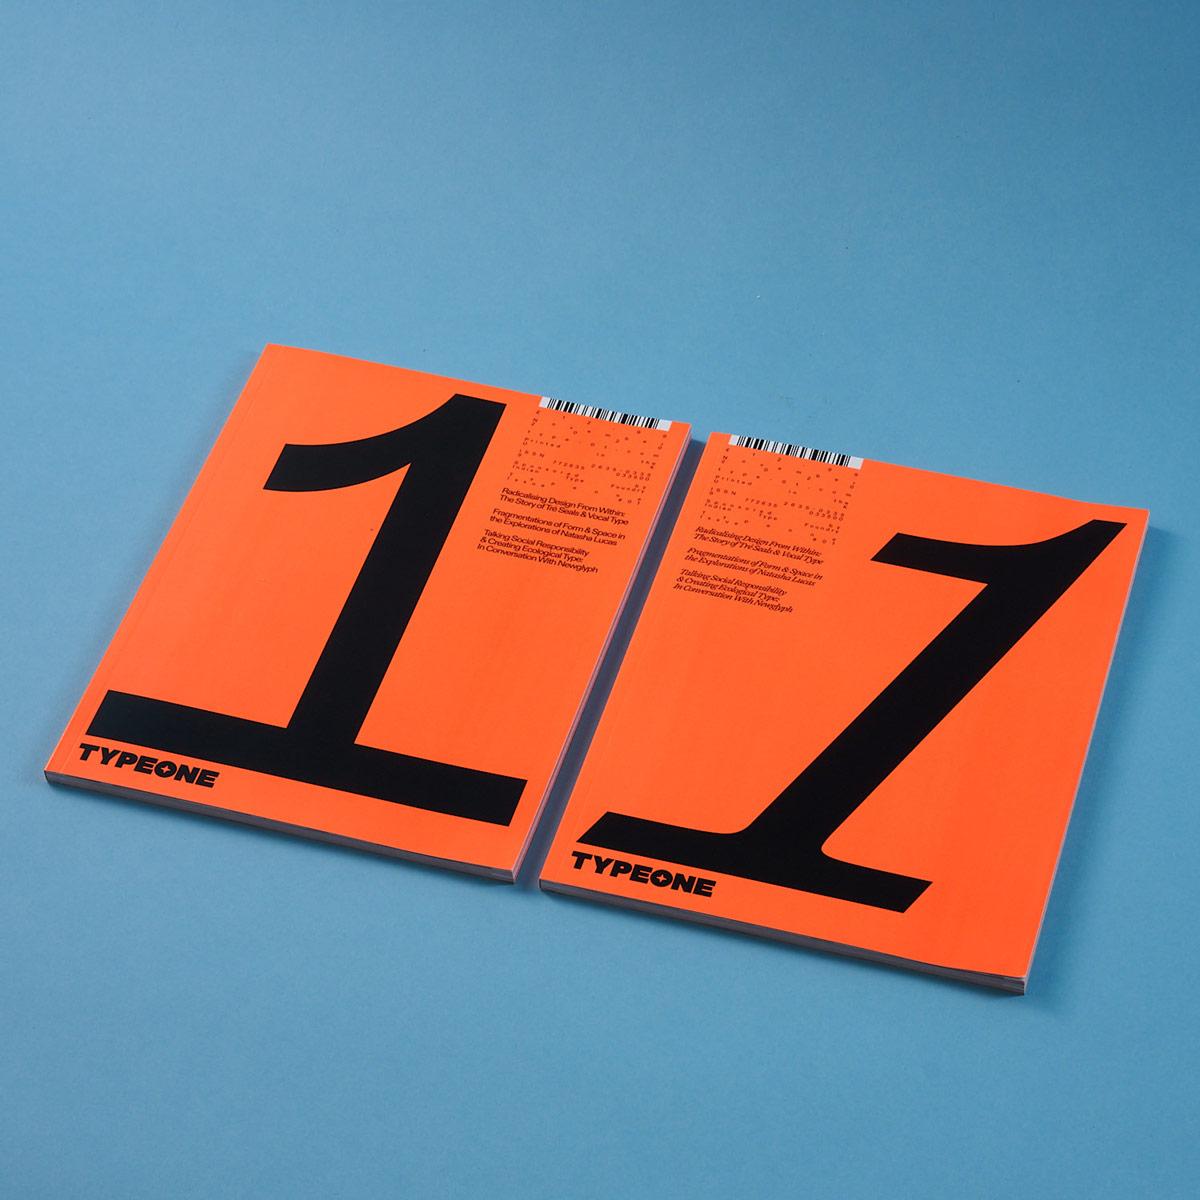 TYPEONE Magazine—Issue 01